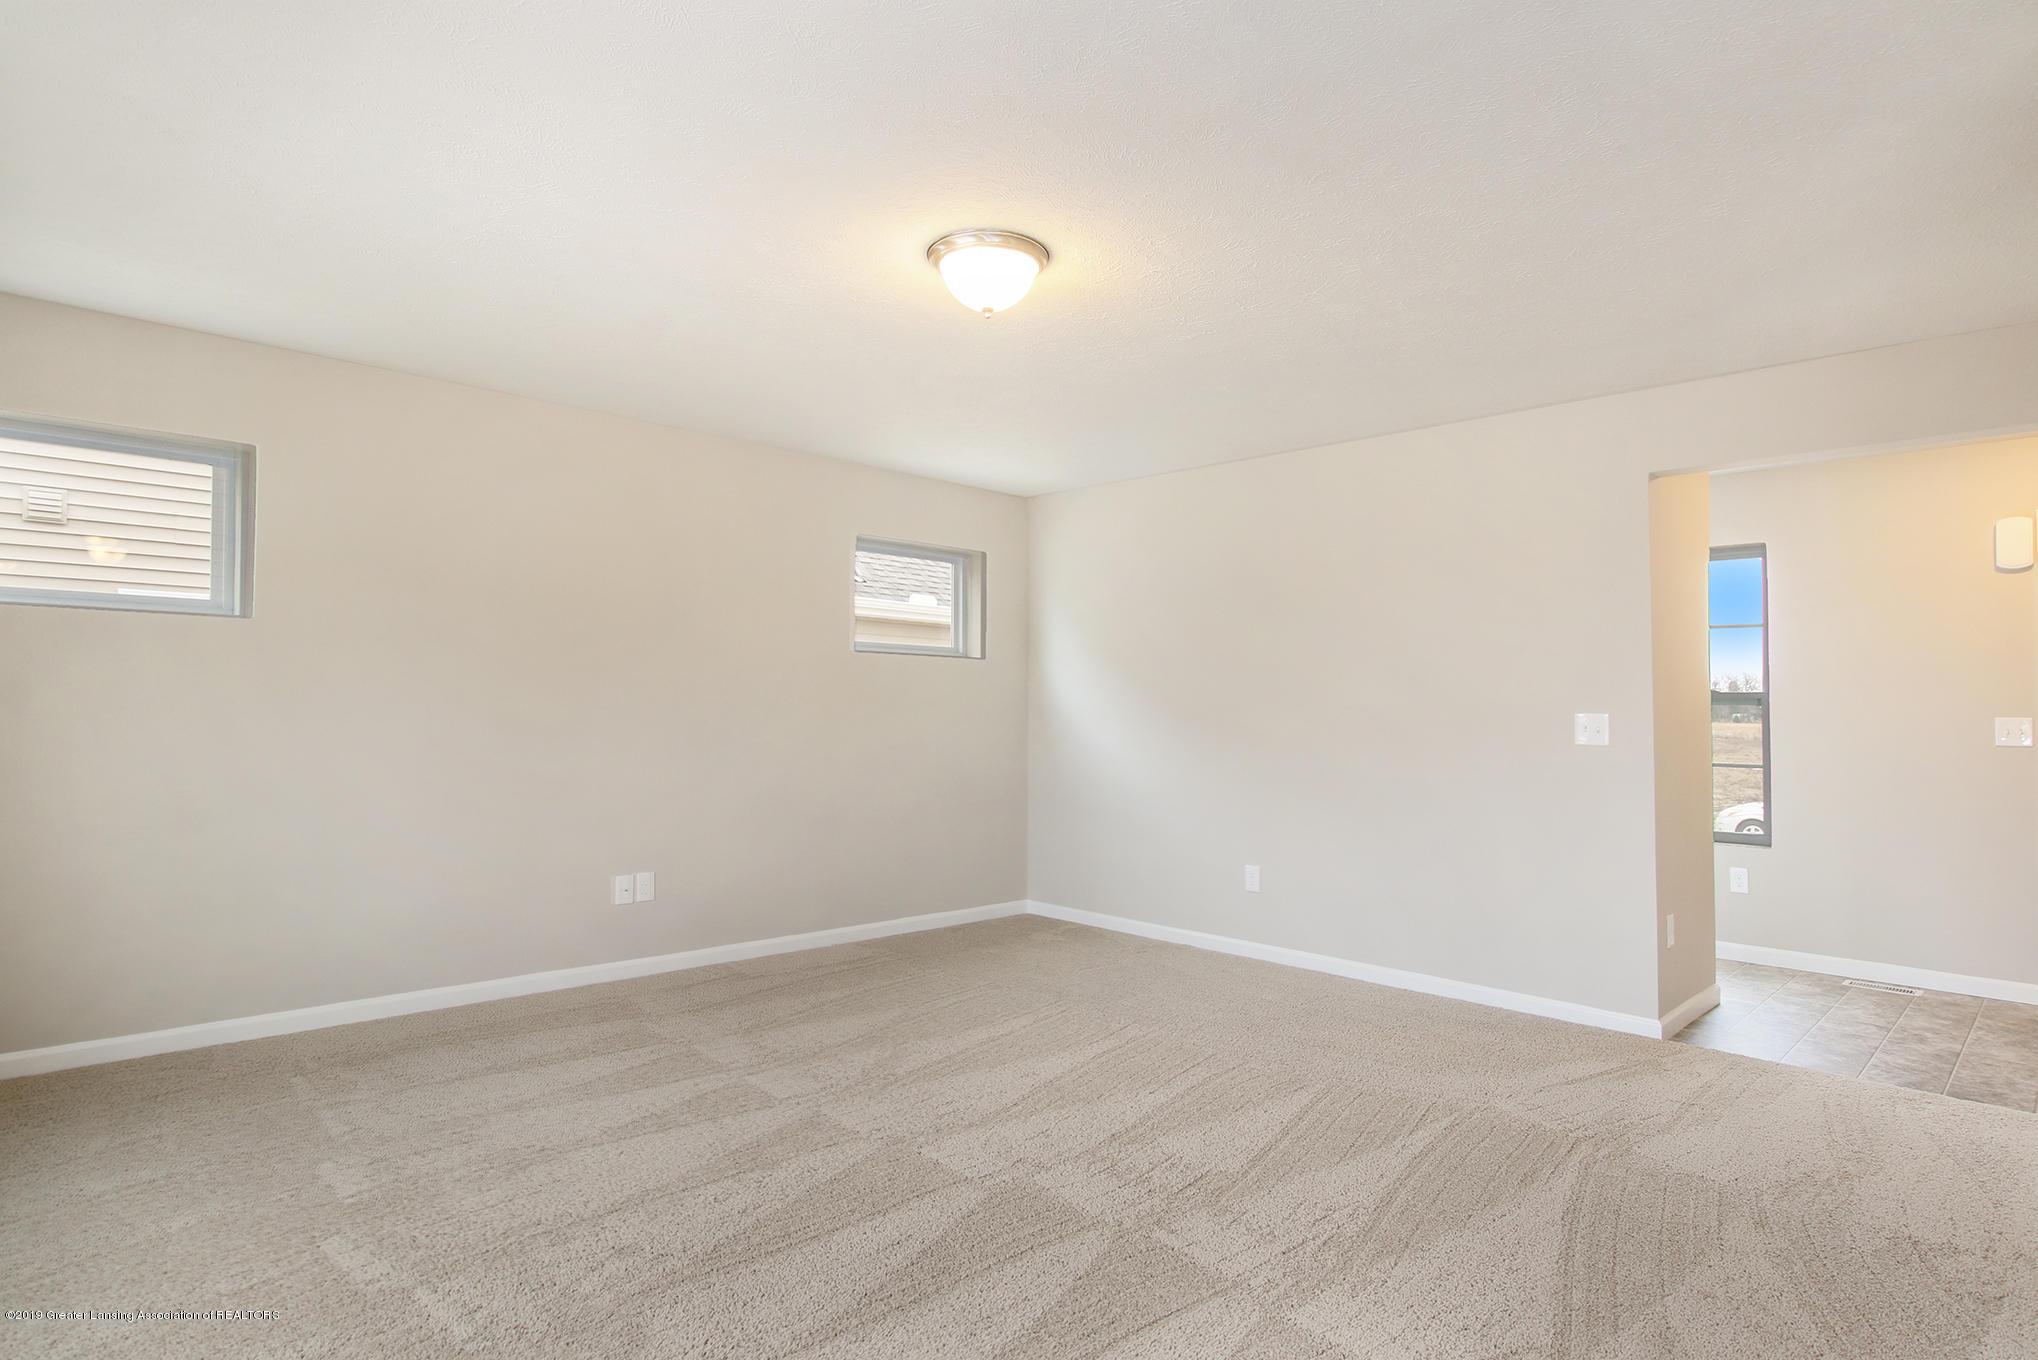 1005 Chesham - MDE024-E1700-Great Room3 - 3